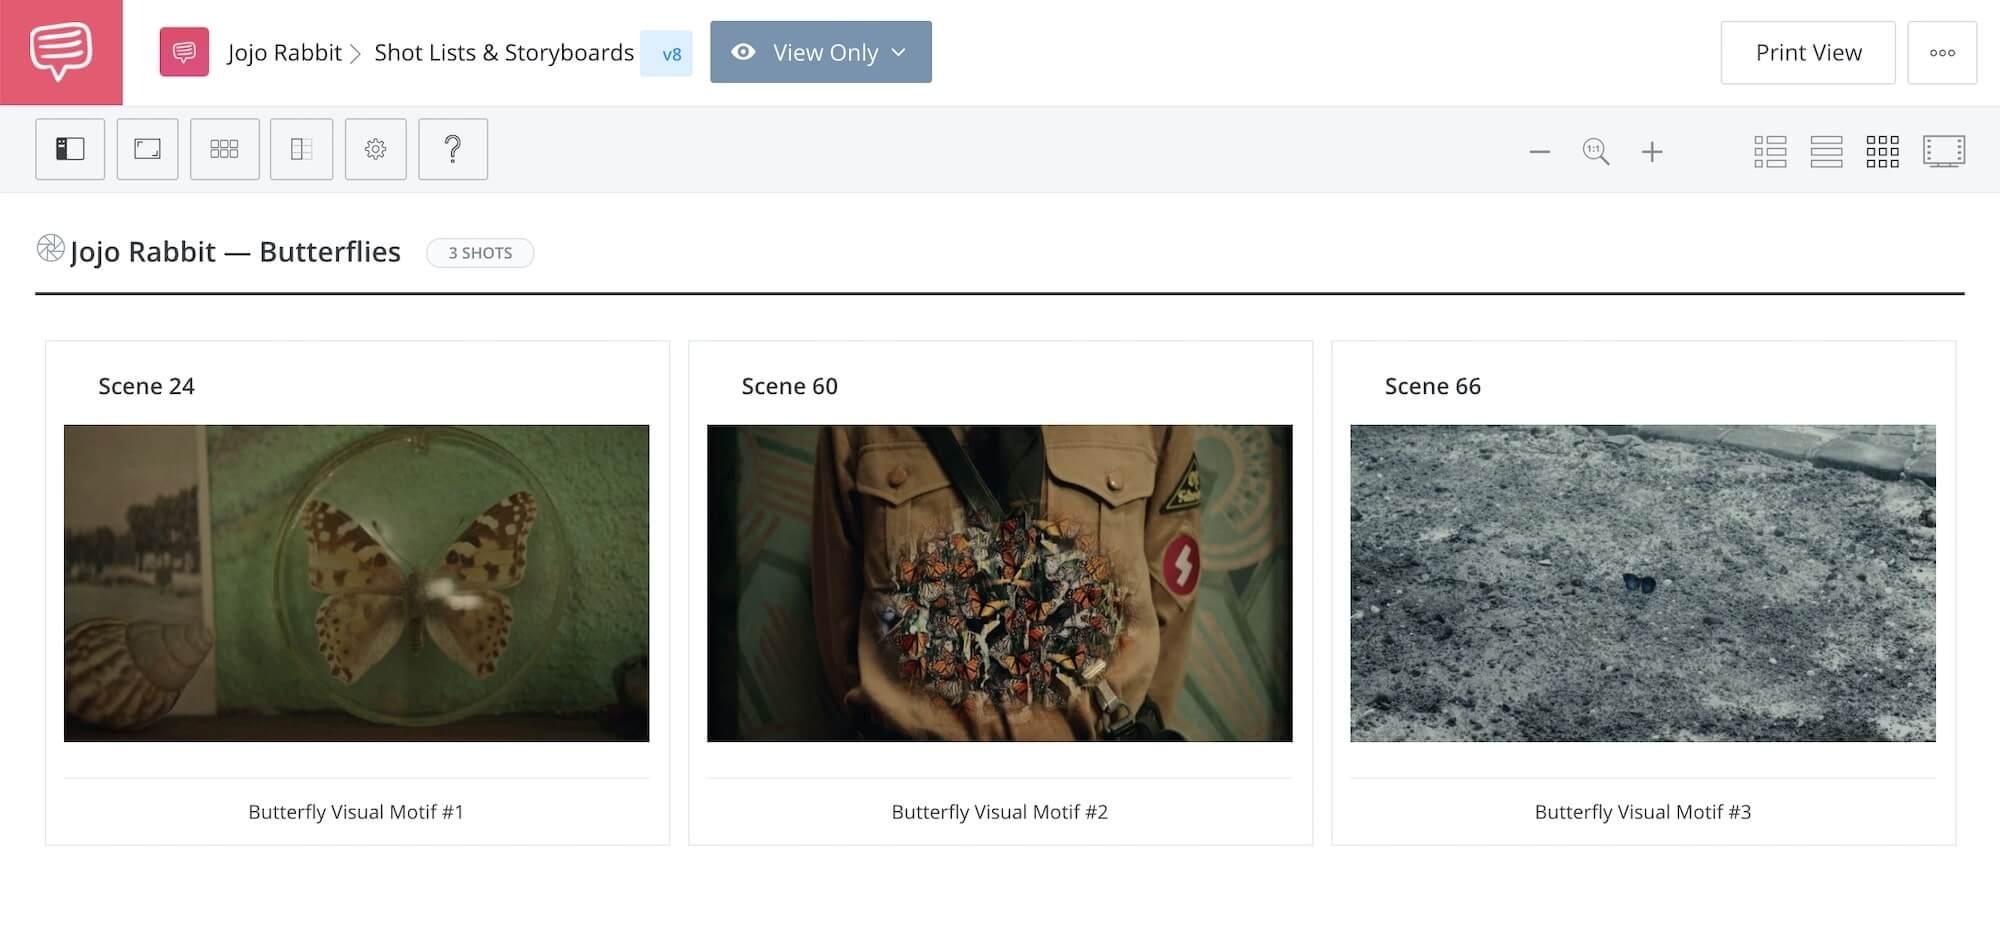 What is Jojo Rabbit About - Jojo Rabbit - Butterfly Motif - StudioBinder Storyboard Software